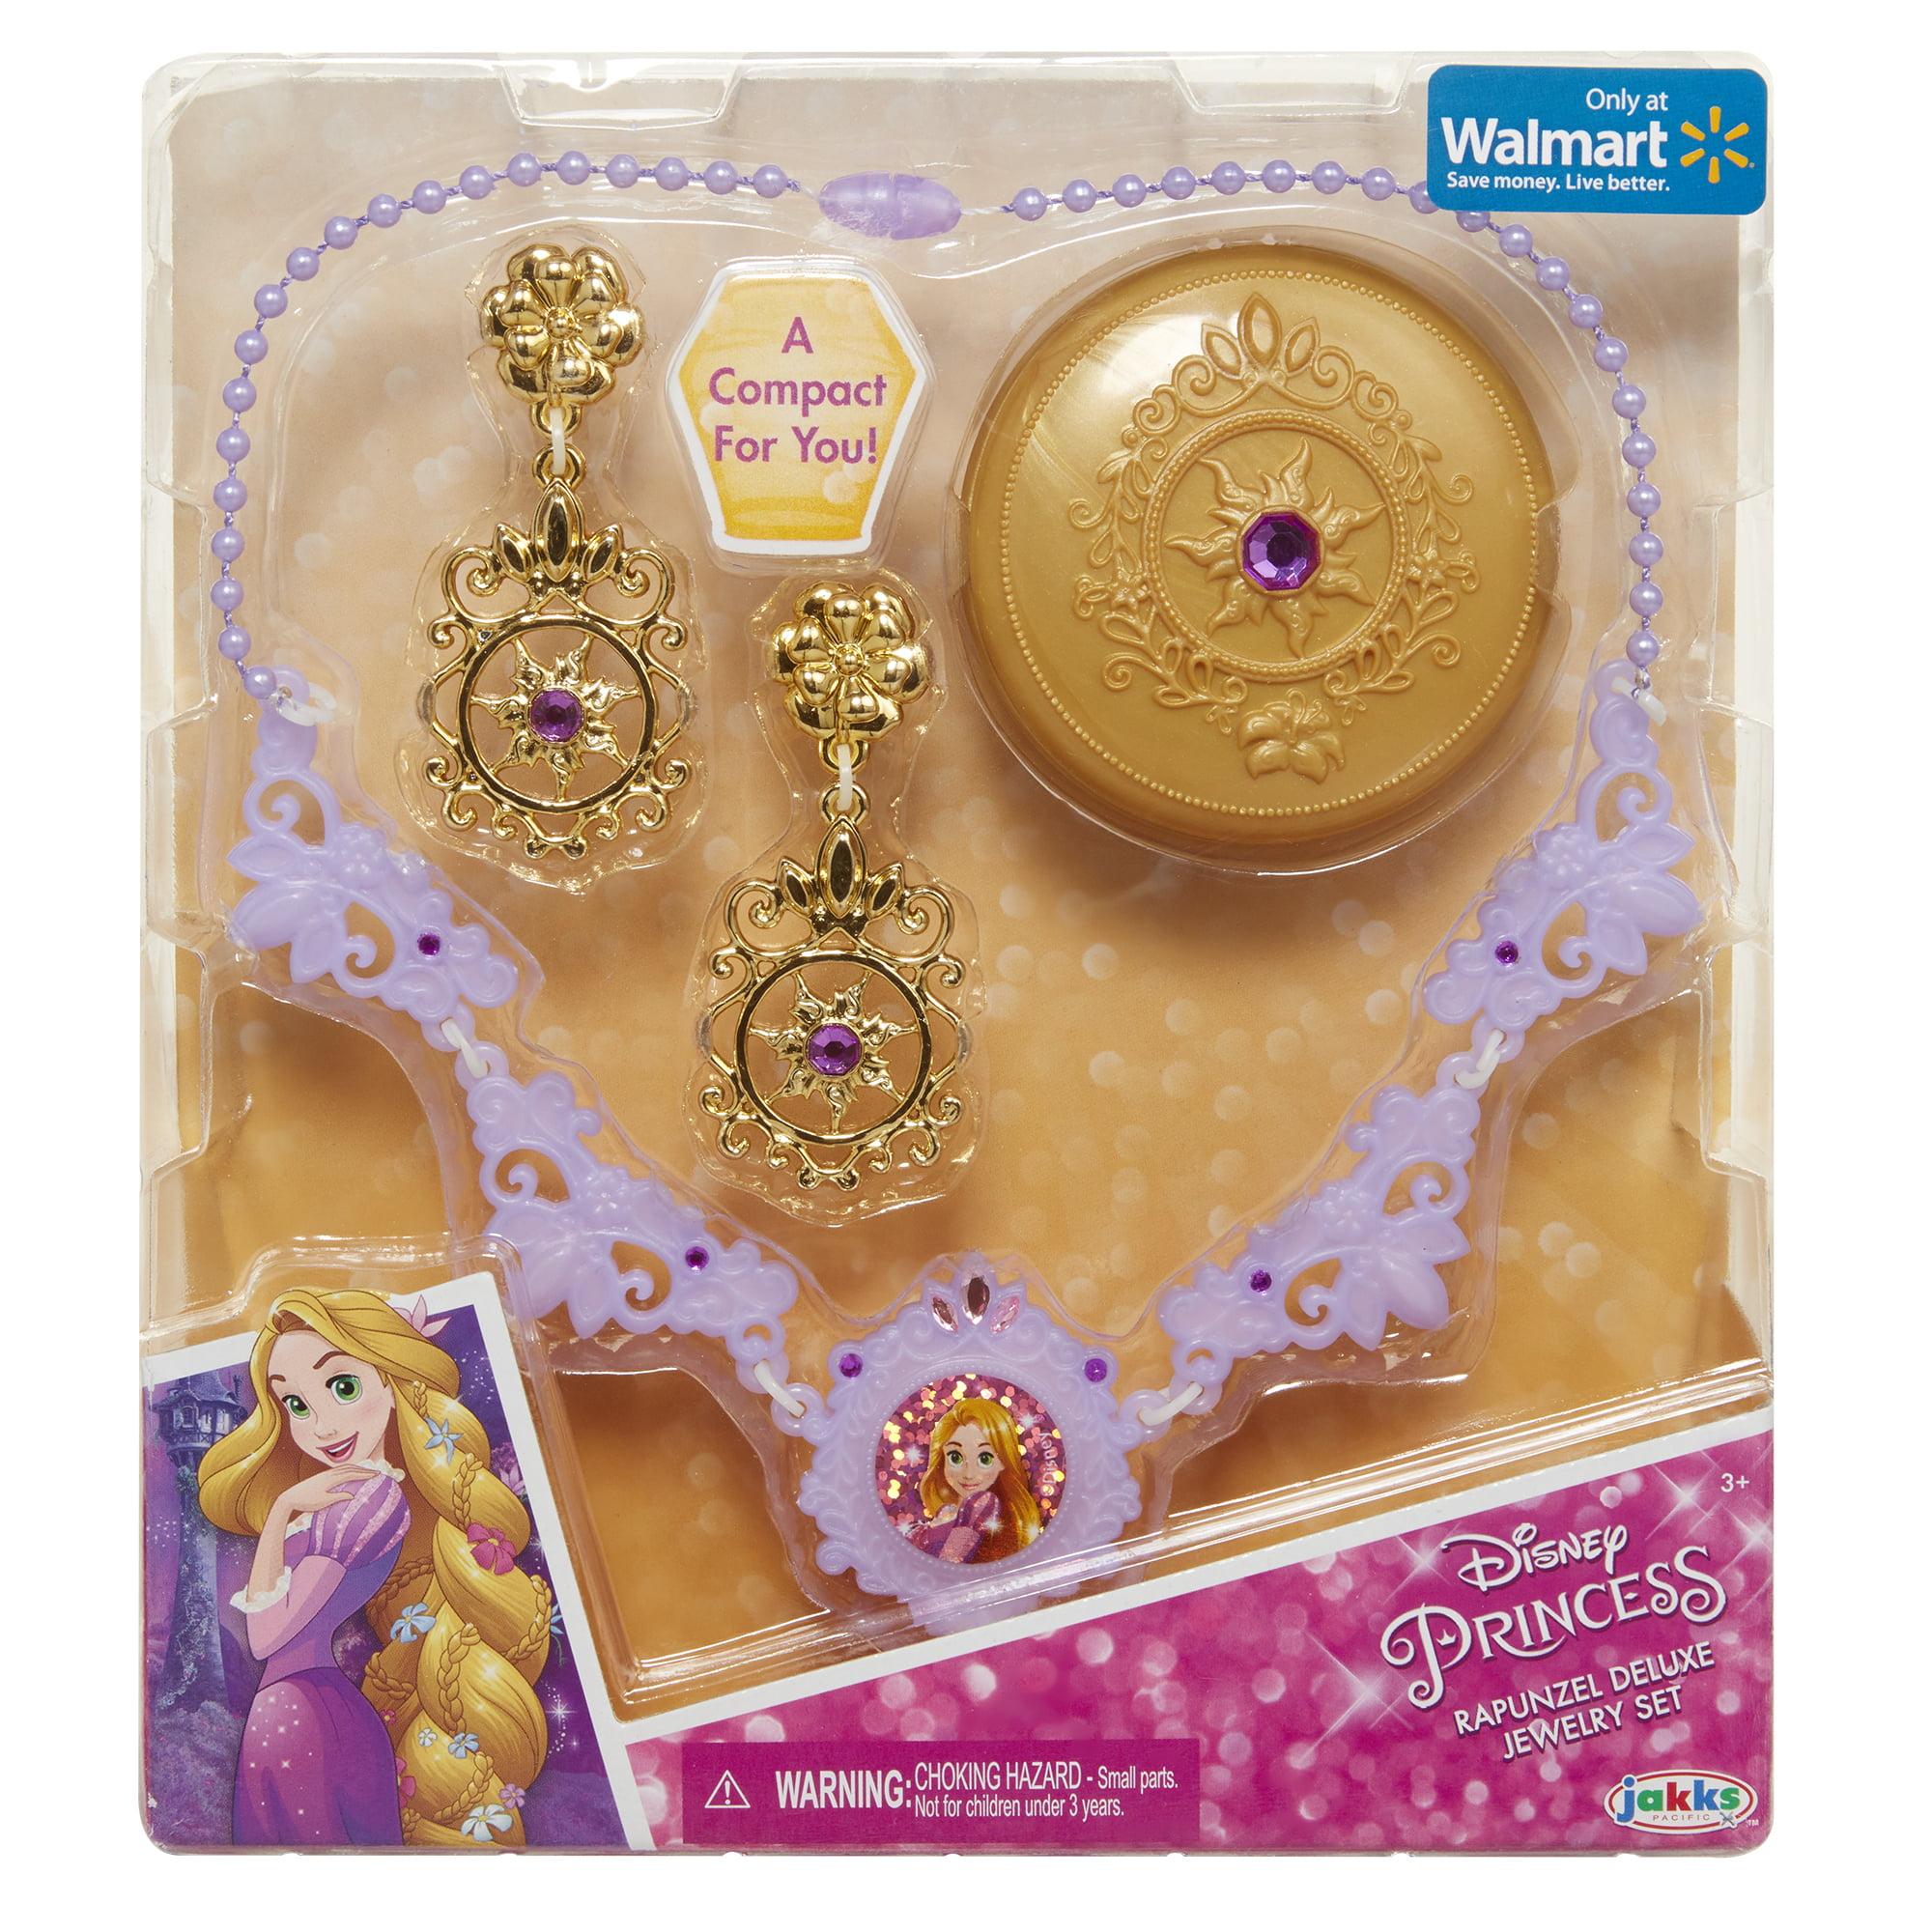 Disney Princess Rapunzel Deluxe Jewelry Set